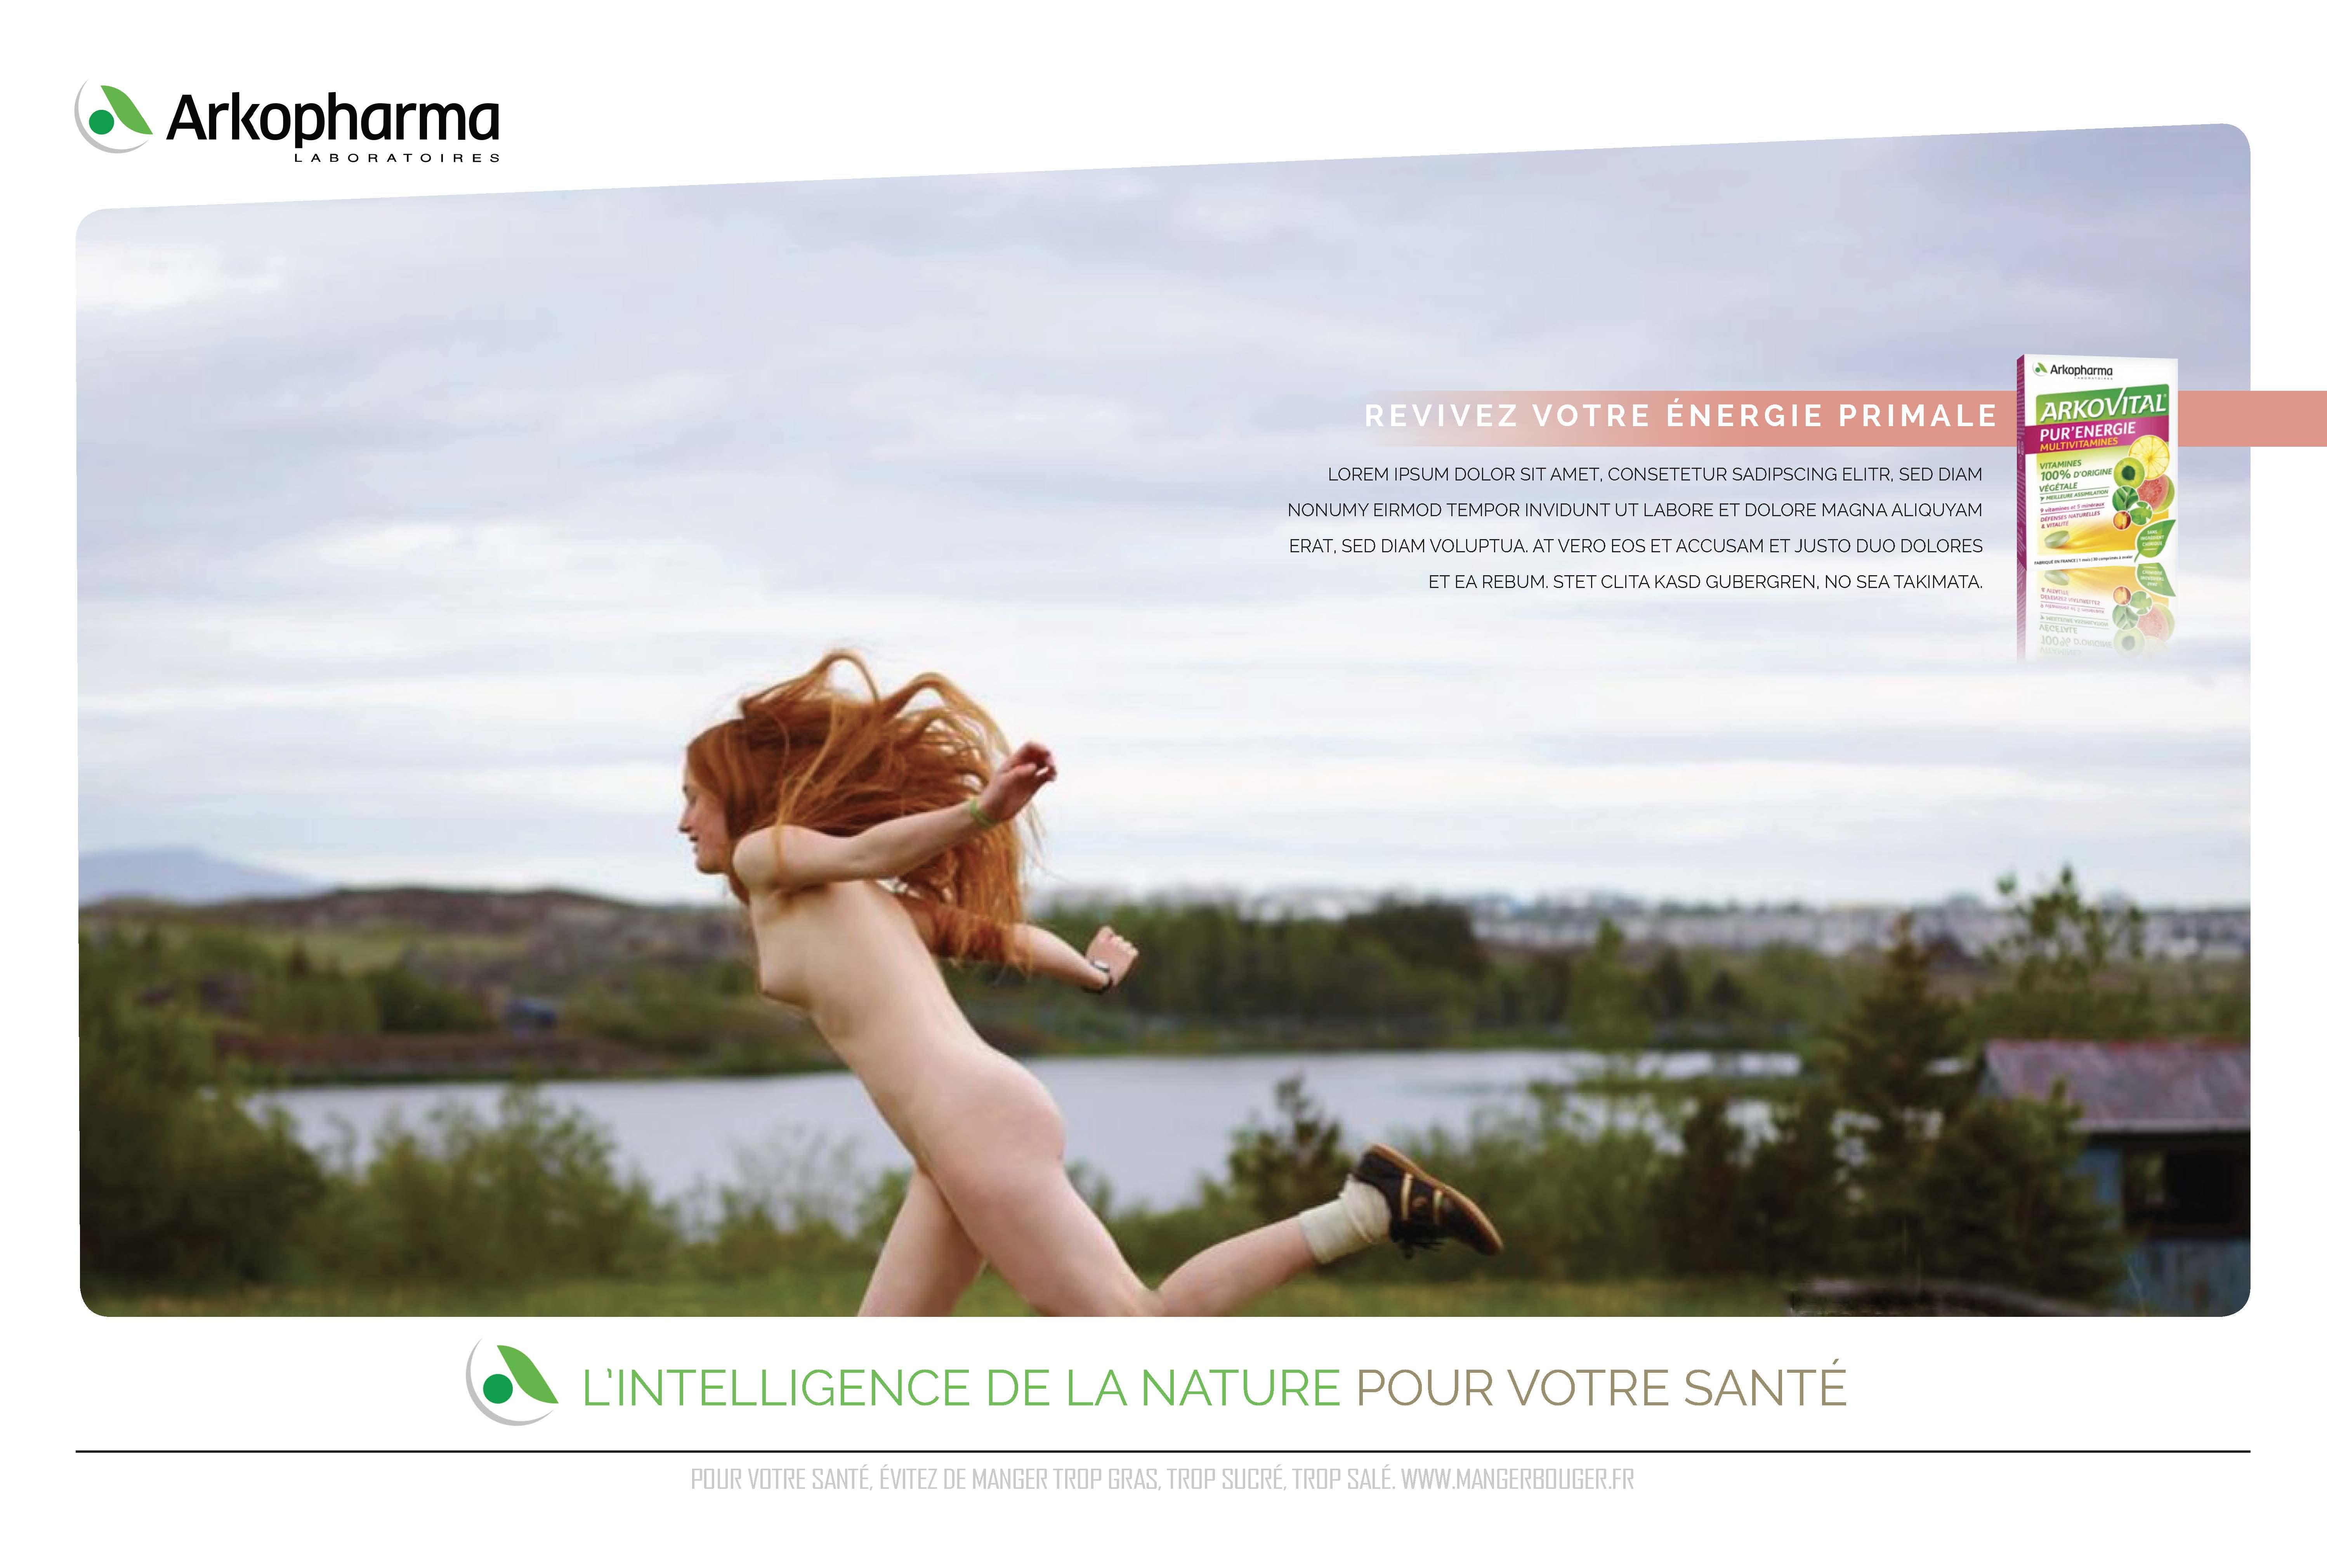 Arkopharma / Campagne institutionnelle